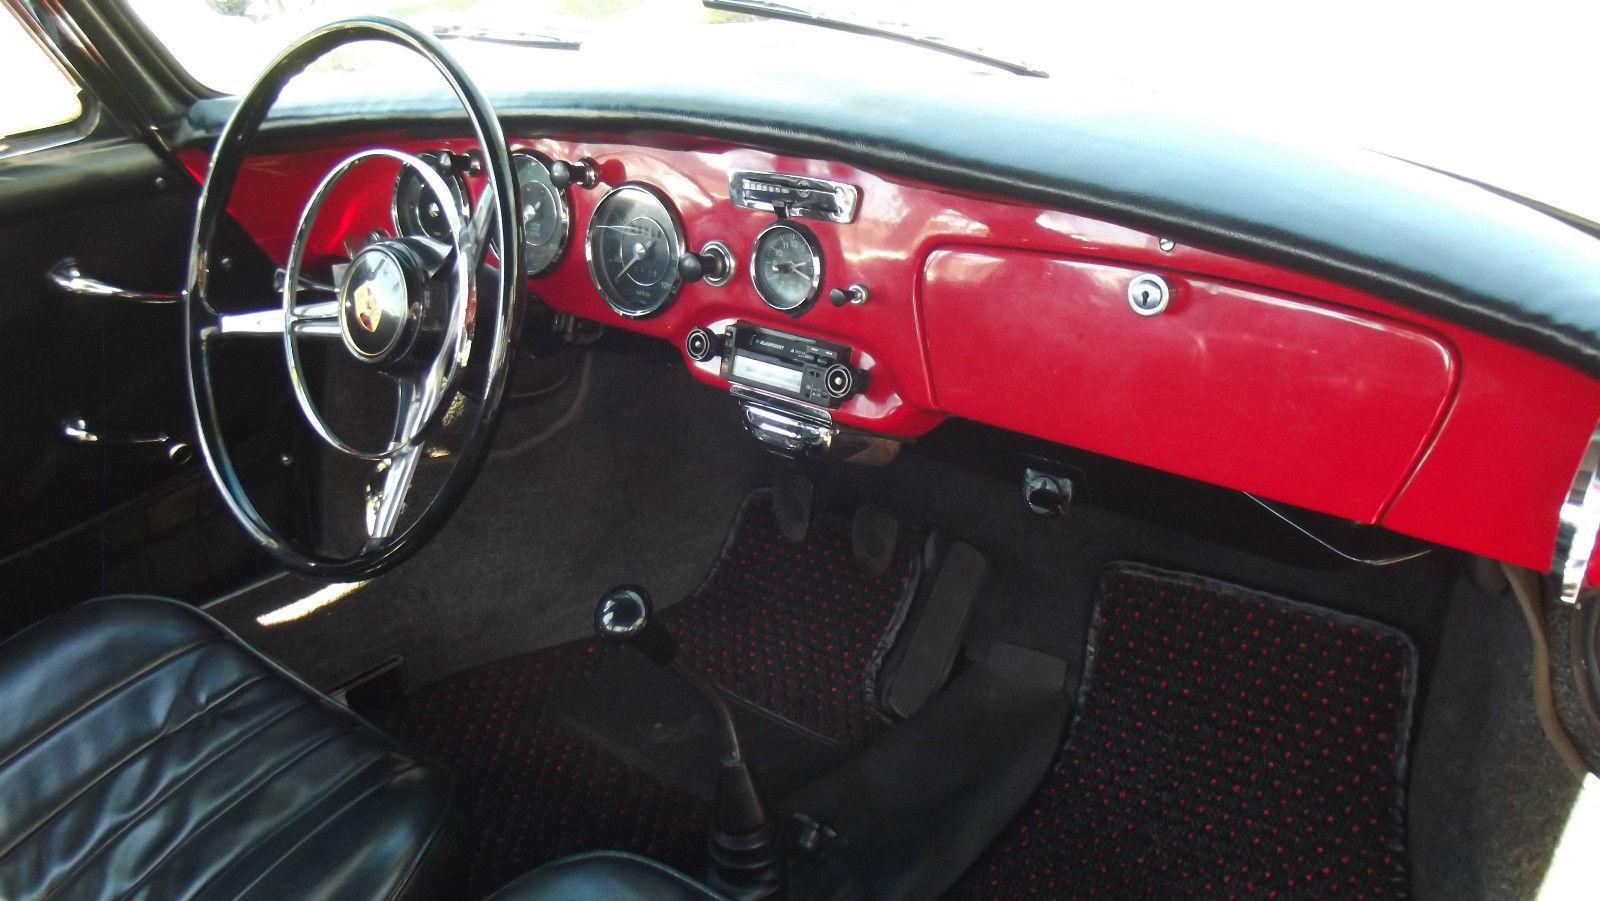 1962 porsche 356 b coupe red with black interior superb california car classic porsche 356. Black Bedroom Furniture Sets. Home Design Ideas